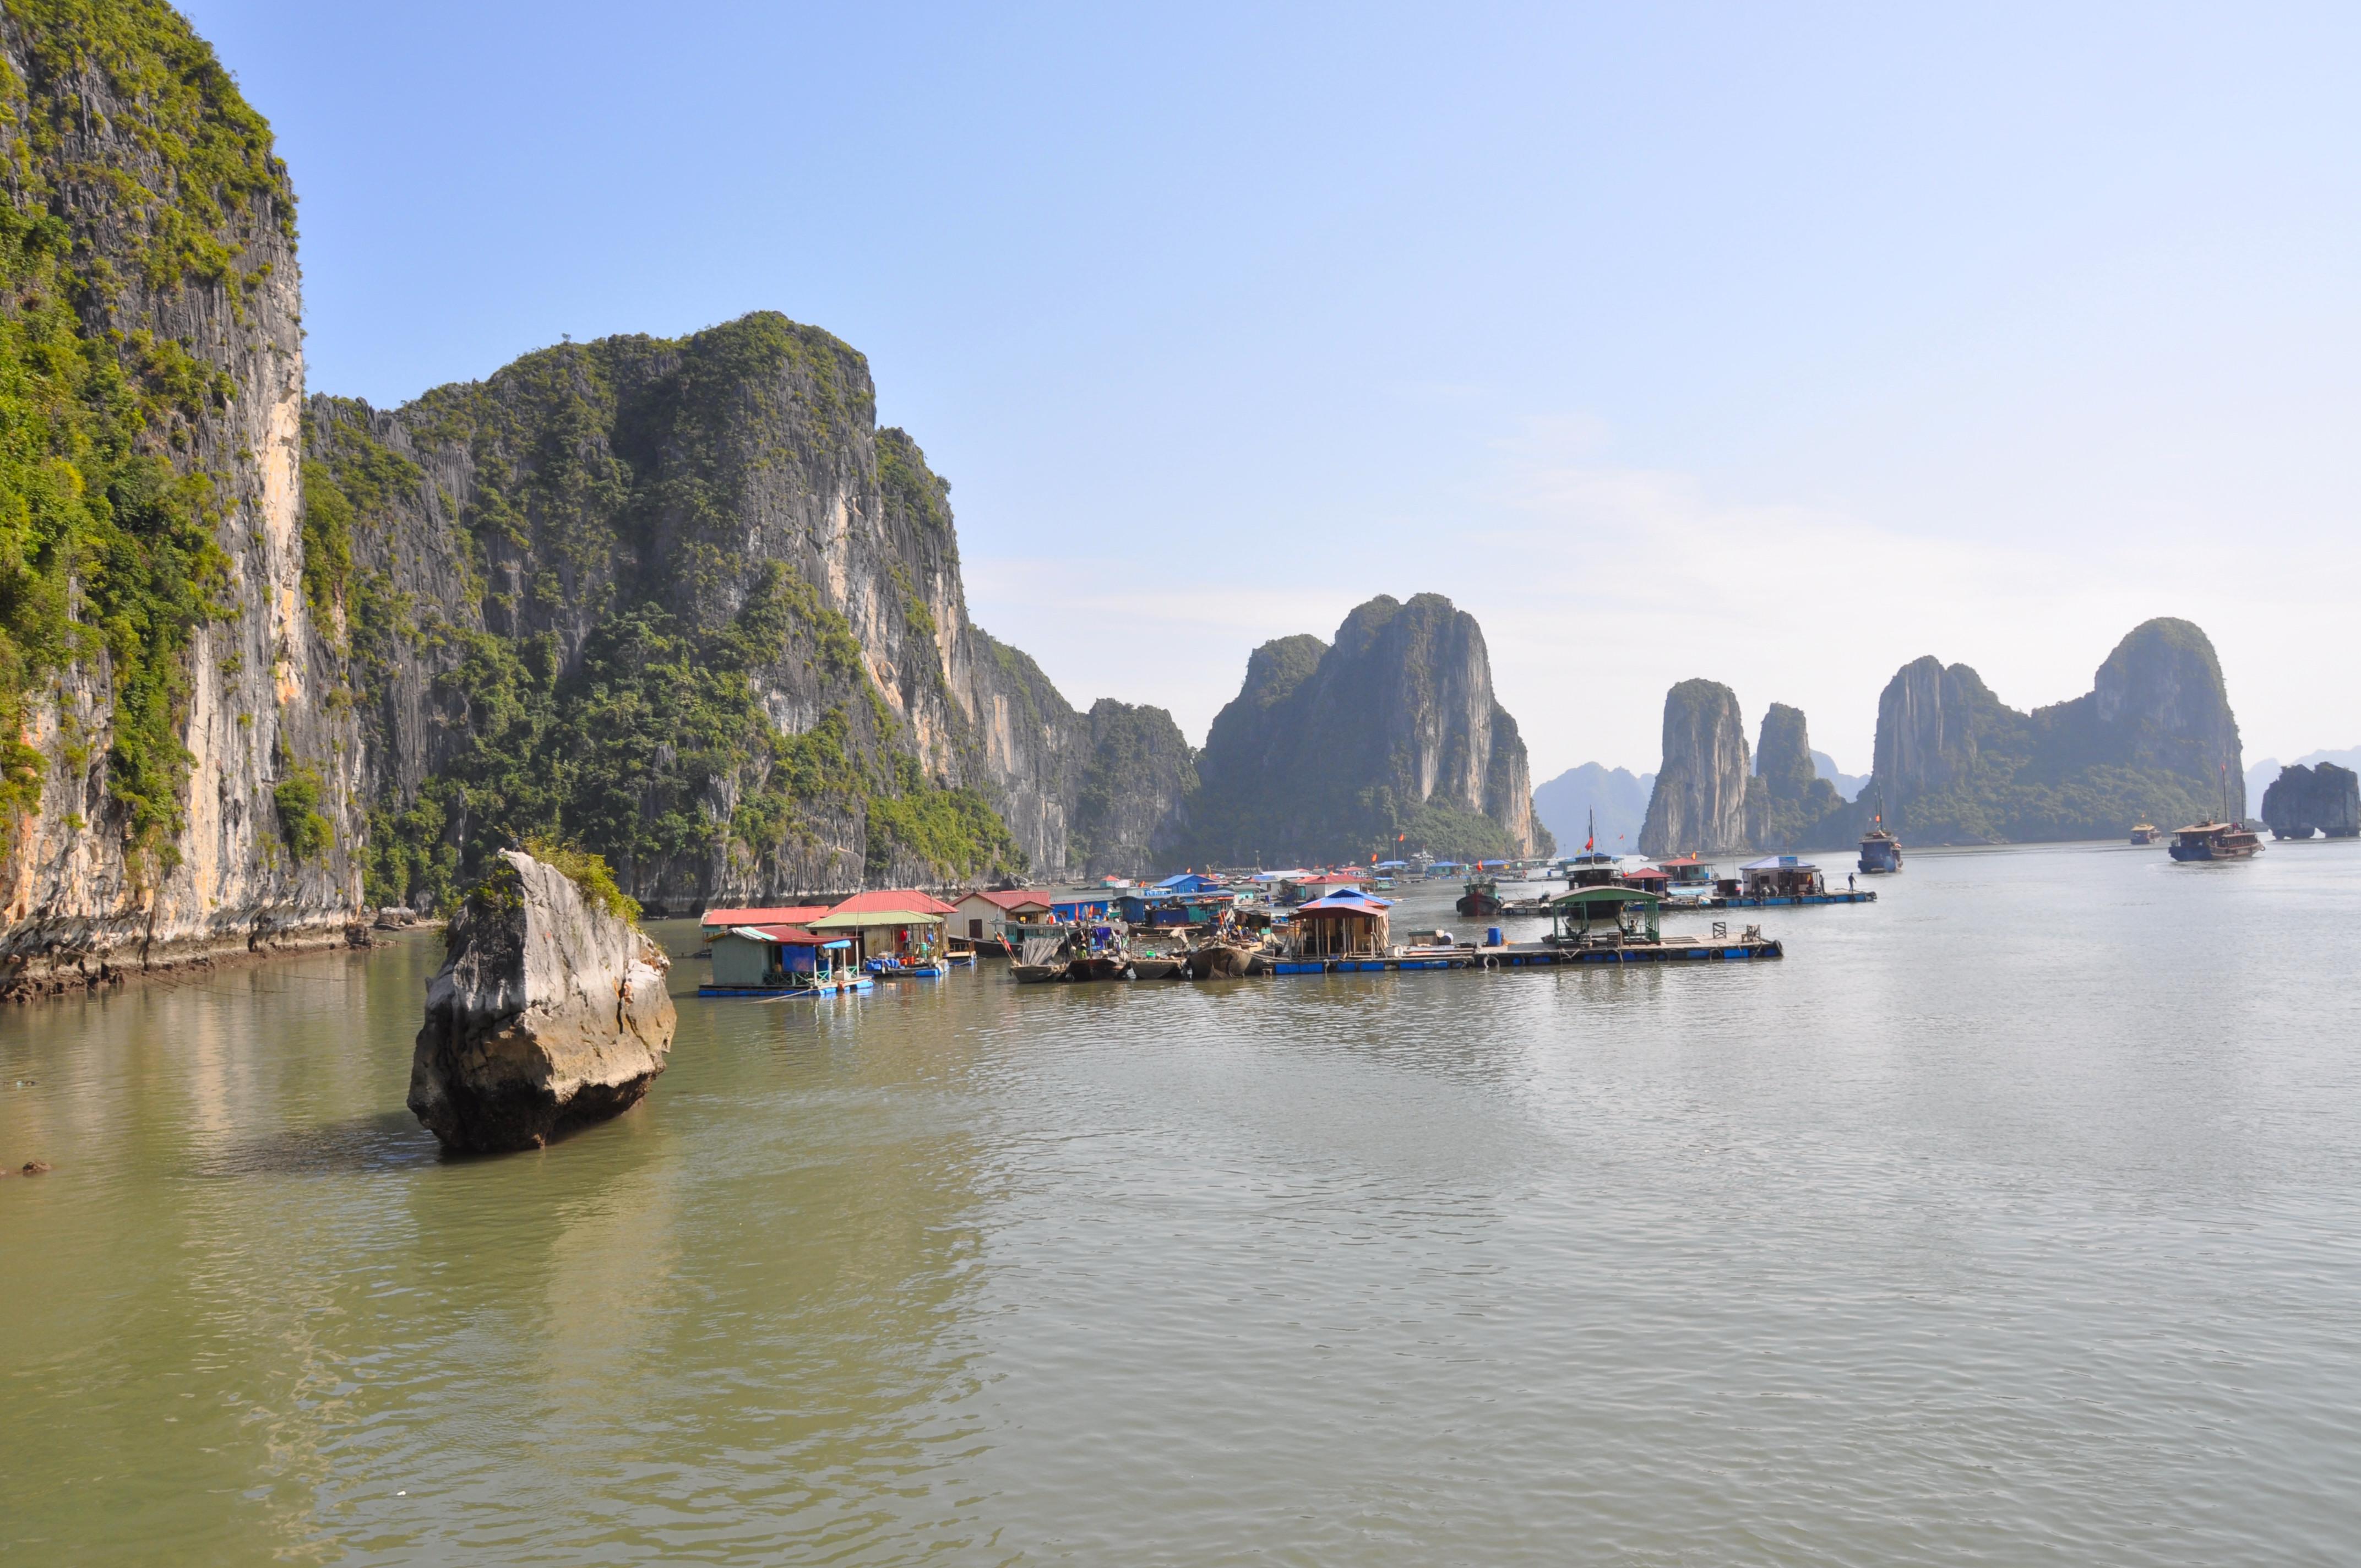 Voyage nord Vietnam hors es sentiers battus Baie d'Halong